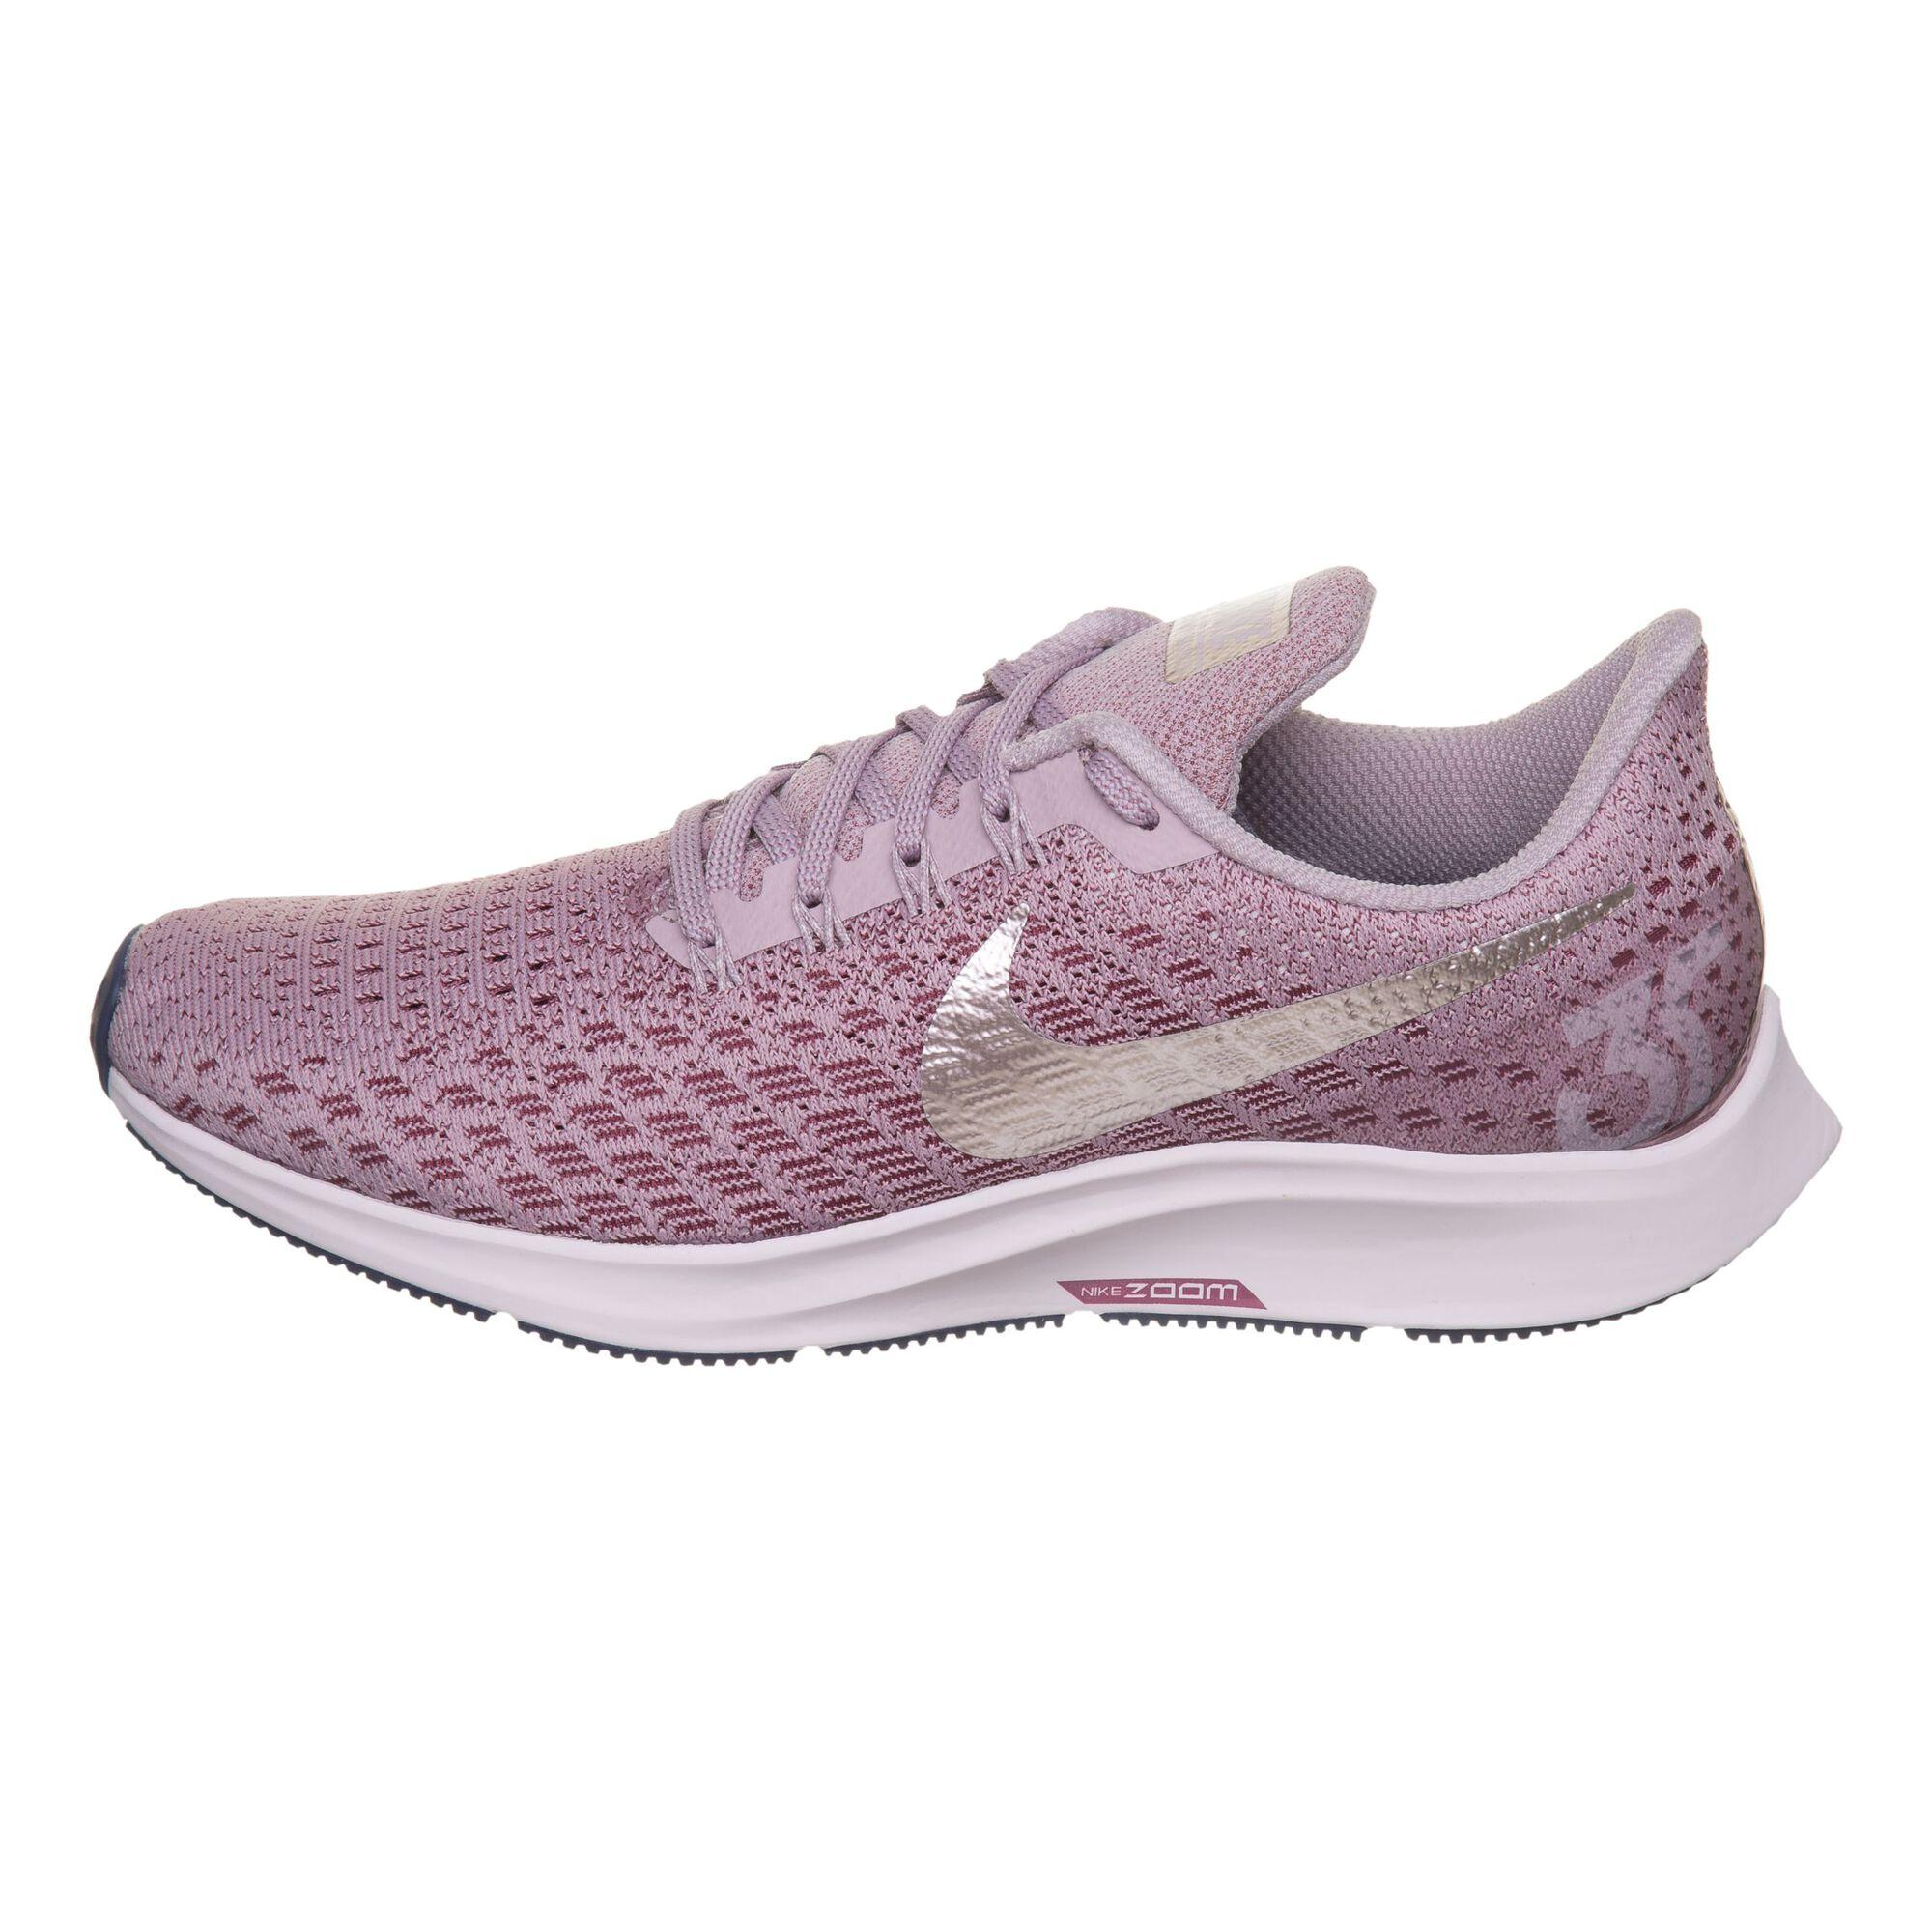 f205cde12612a7 Nike  Nike  Nike  Nike  Nike  Nike  Nike  Nike  Nike  Nike. Air Zoom  Pegasus 35 Women ...